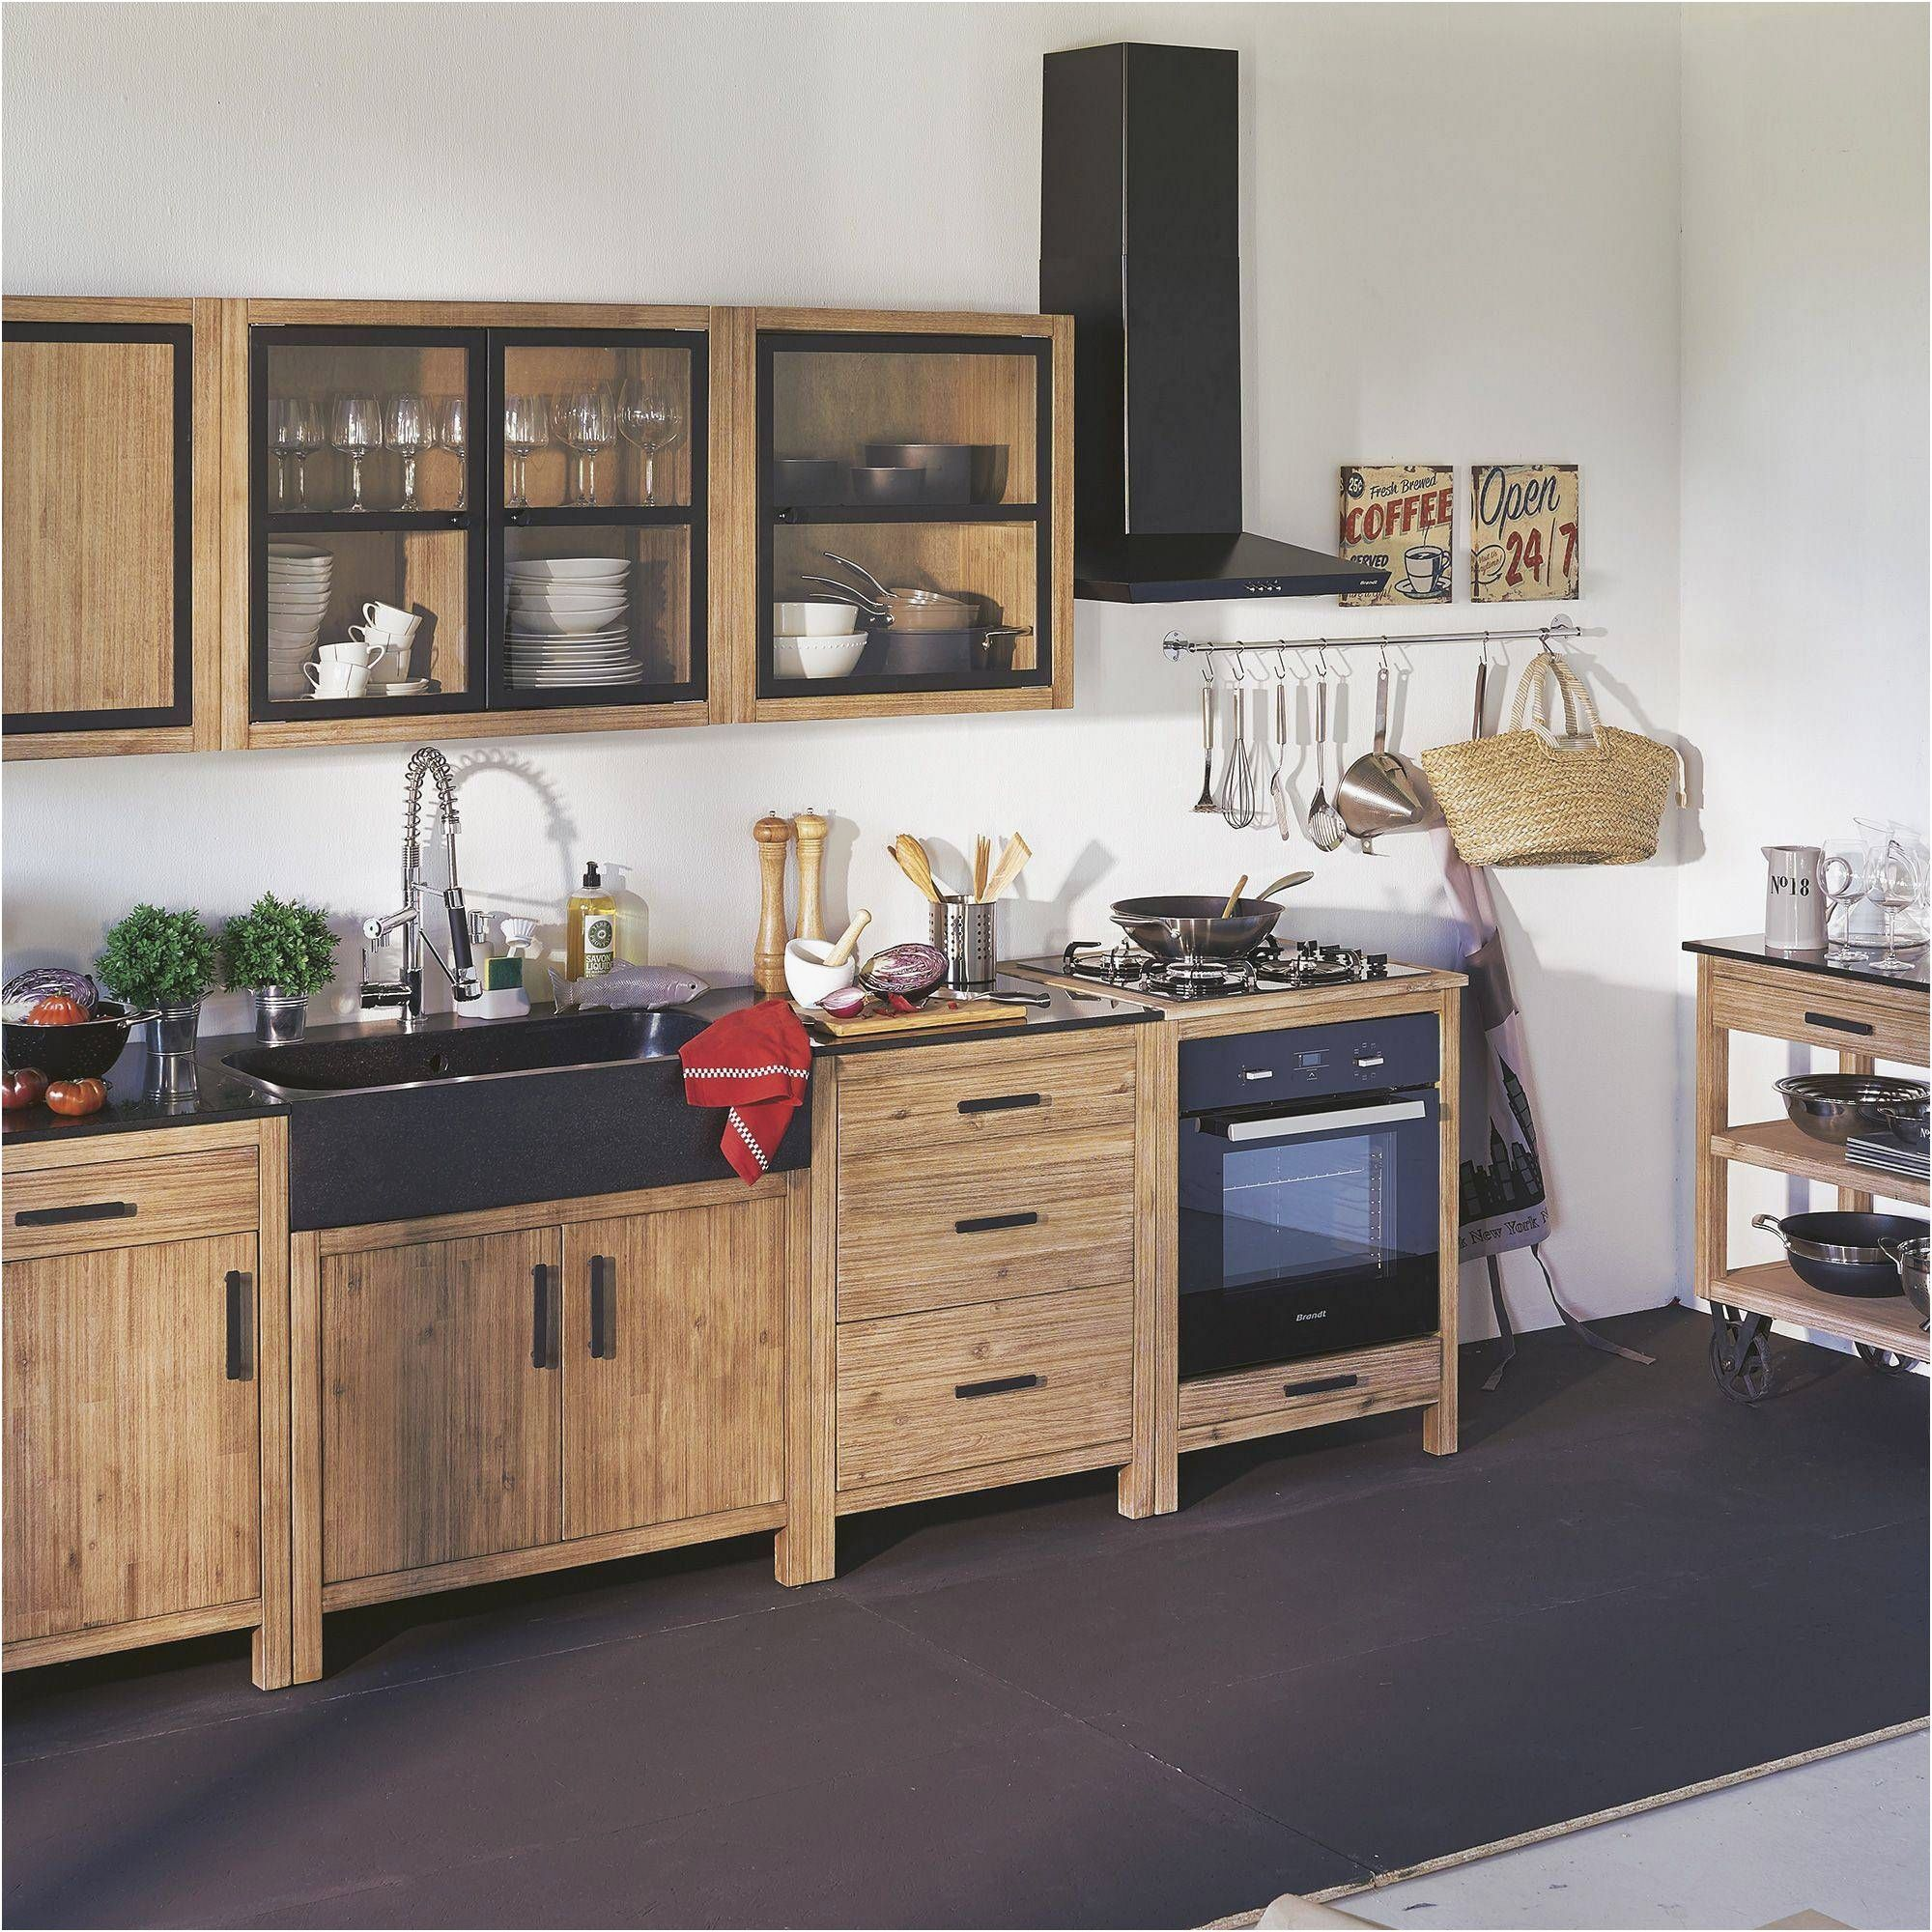 110cm alinea lys meuble haut cuisine